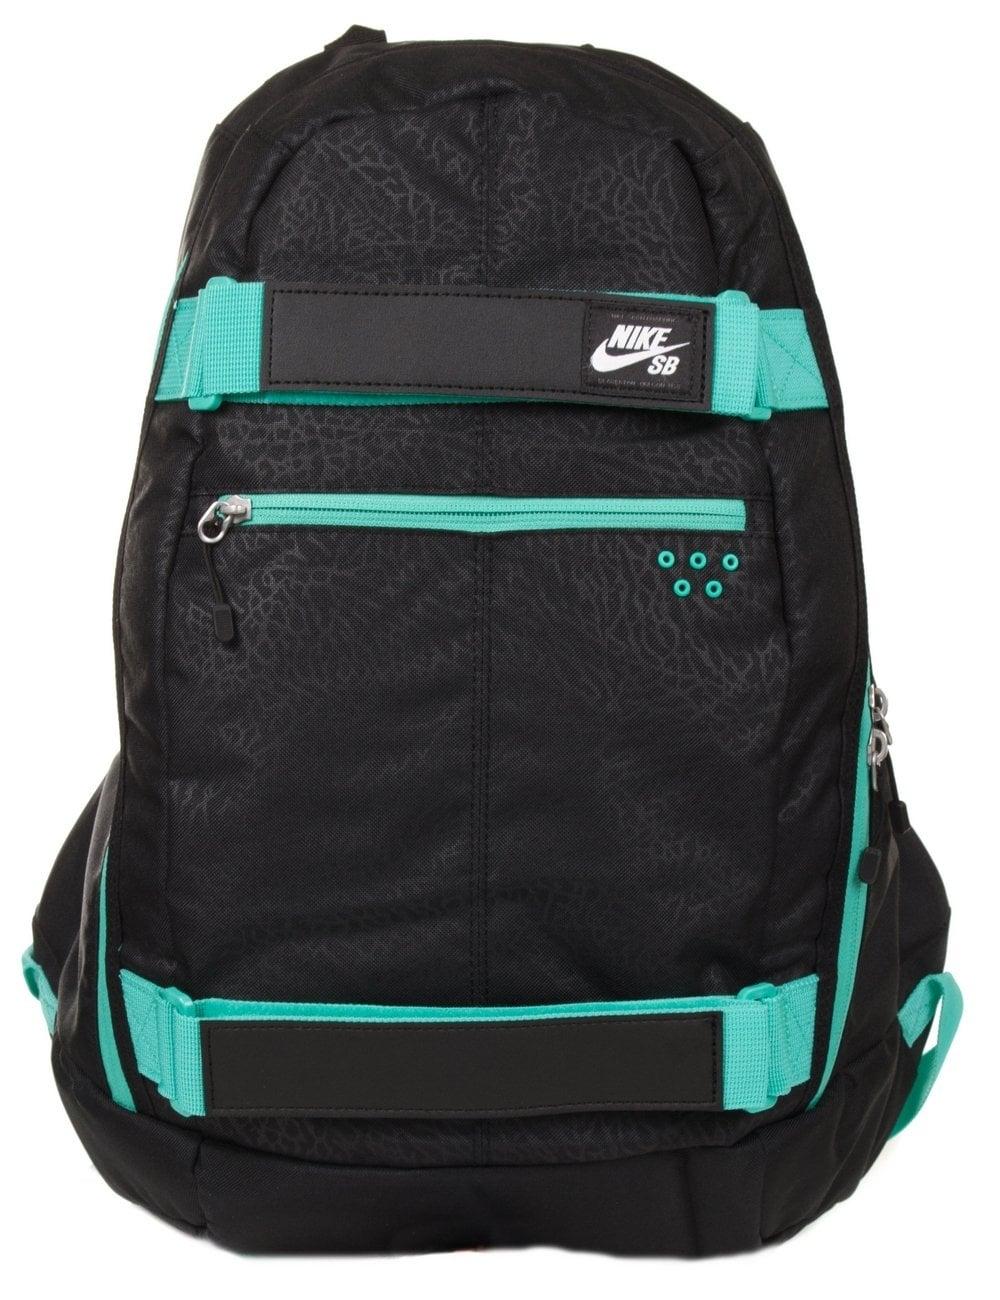 703bf36b8d72 Nike SB Embarca Backpack - Black Turq - Accessories from Fat Buddha ...